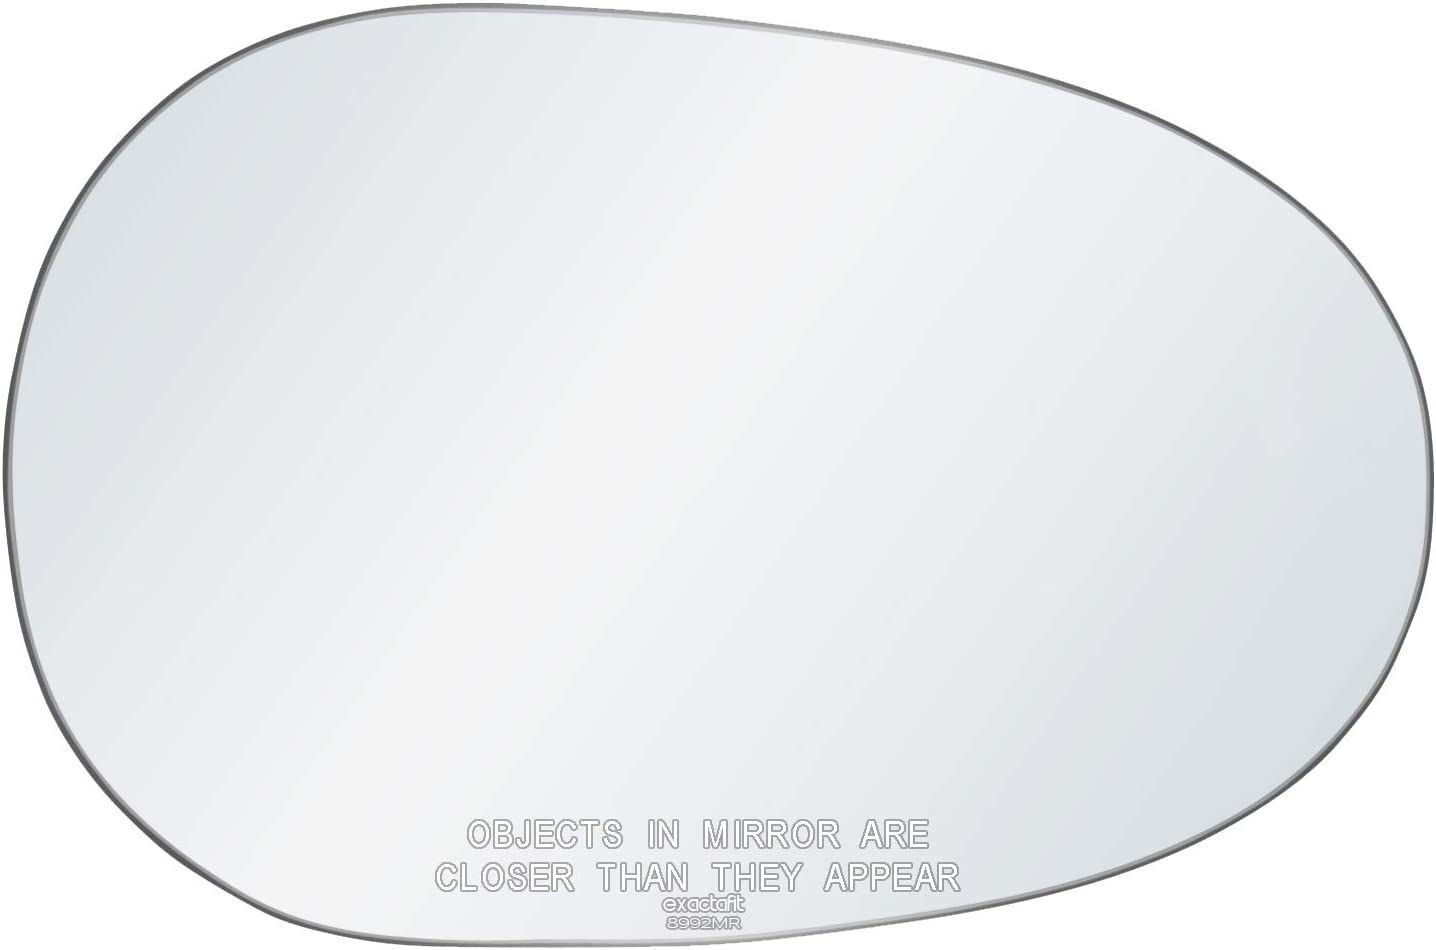 exactafit 8992MR Passenger Side Mirror Glass Replacement Plus 3M Adhesives Compatible With Mazda Miata 1990-1997 Suzuki X-90 1996-1998 Right Hand Door Wing RH